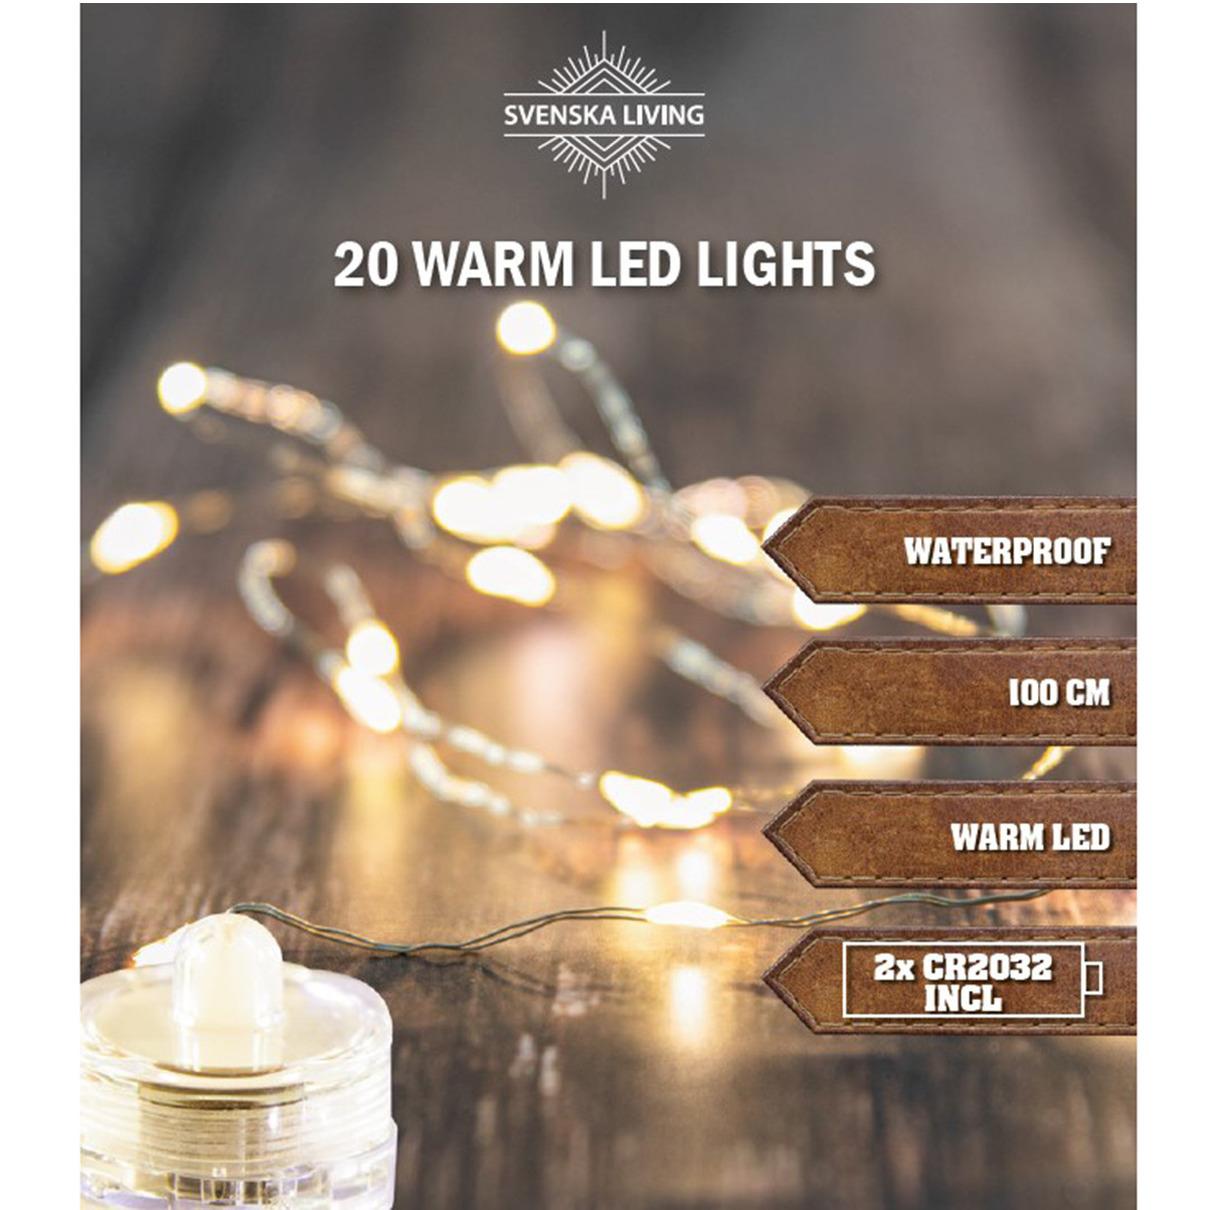 Waterproof verlichting lichtdraad op batterij 20 warm witte lampjes